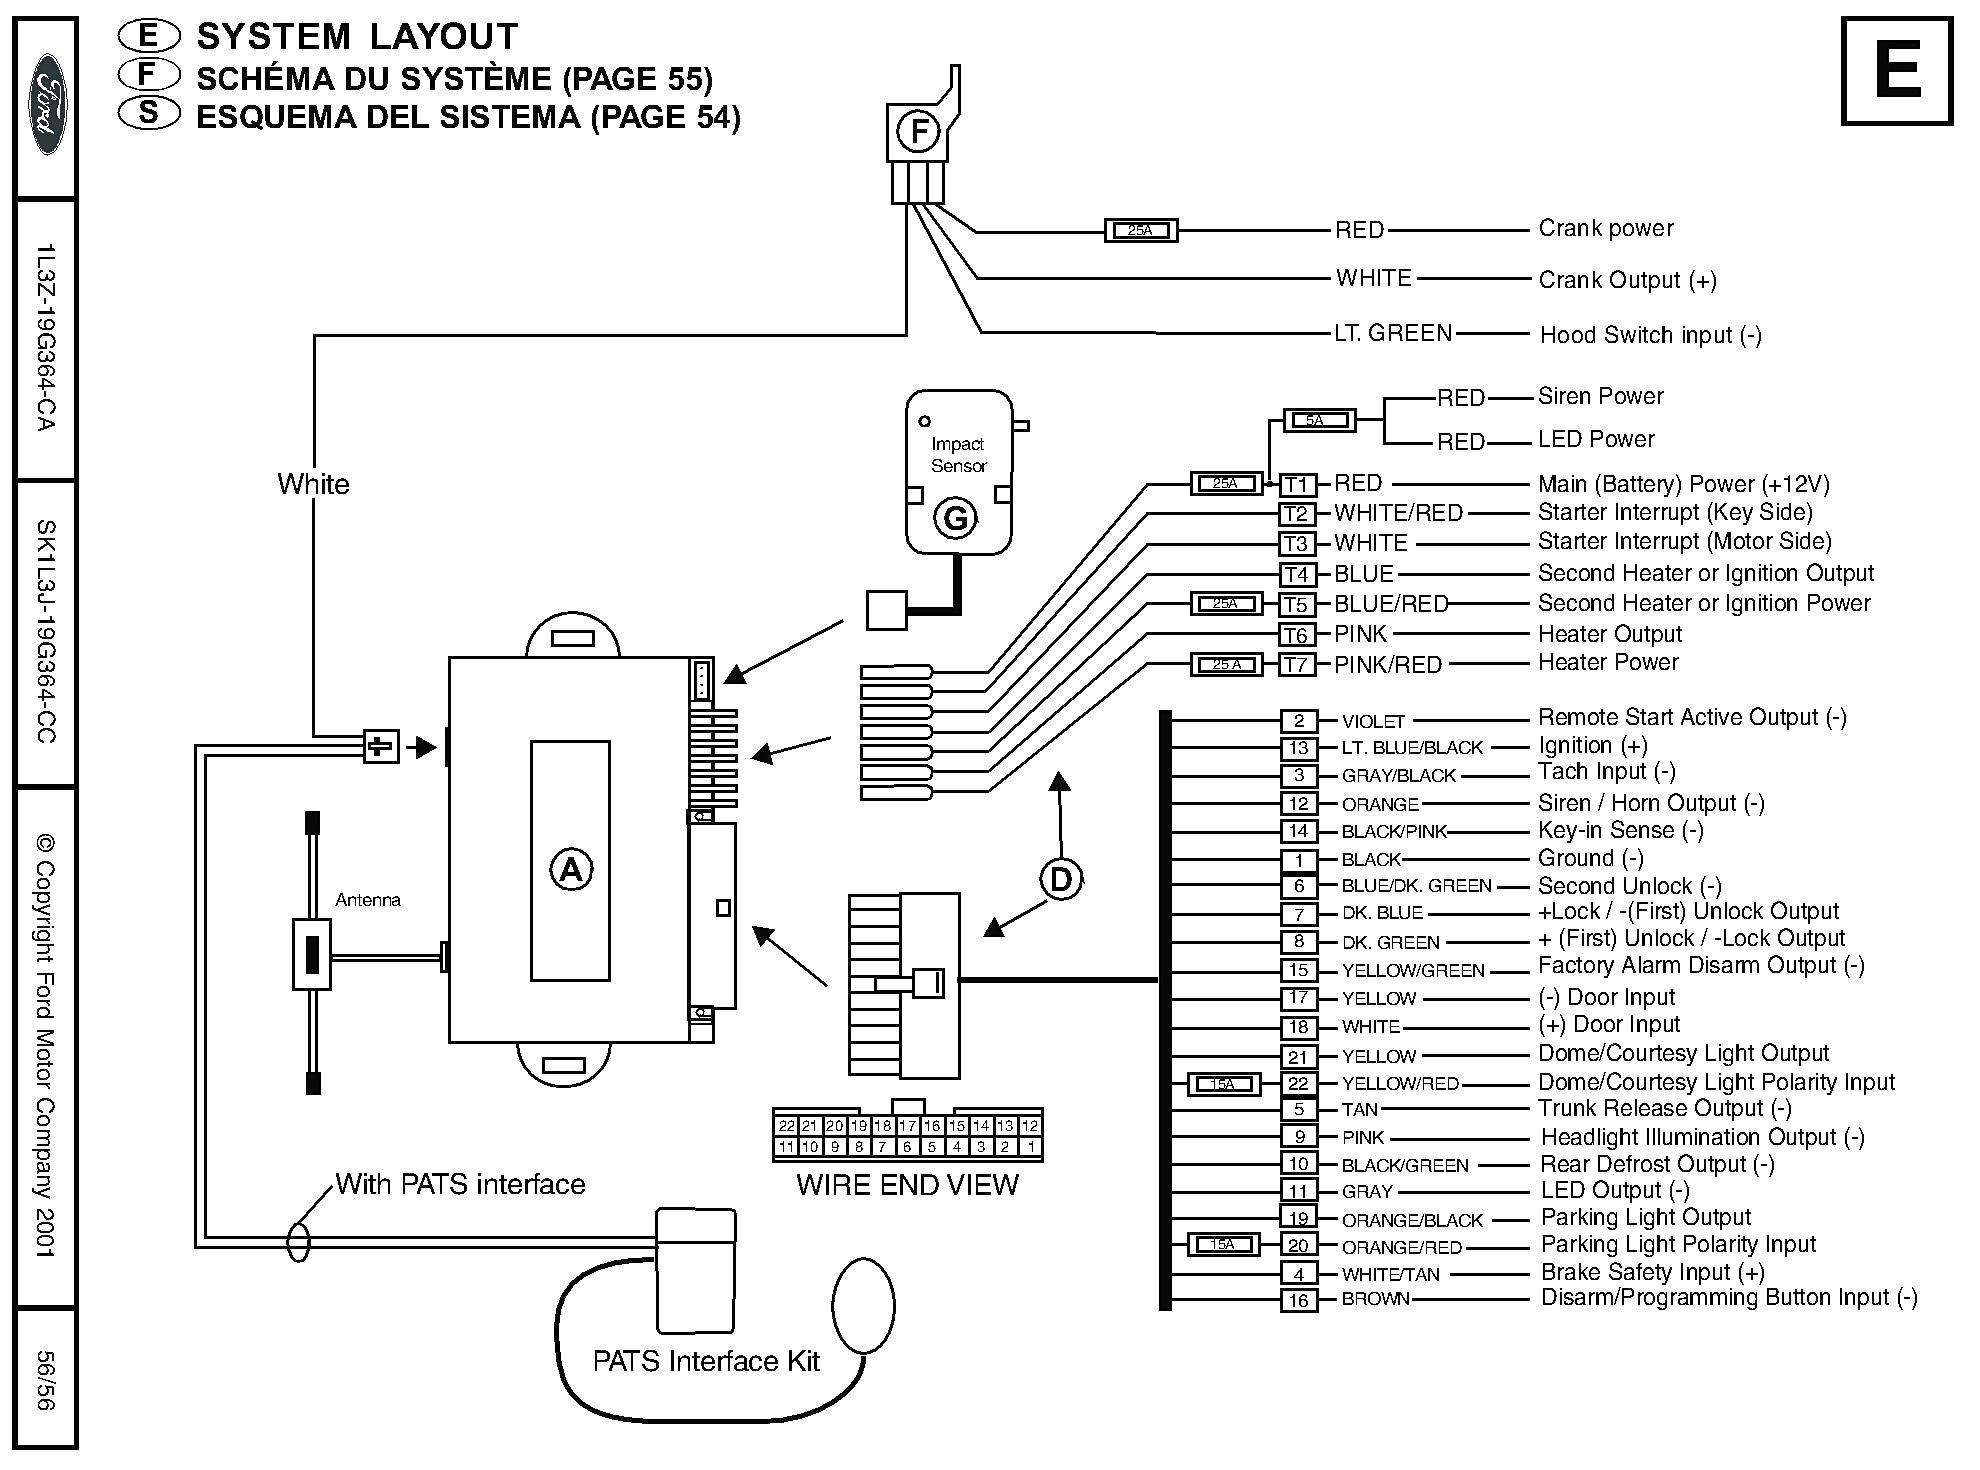 delphi remote start wiring diagram